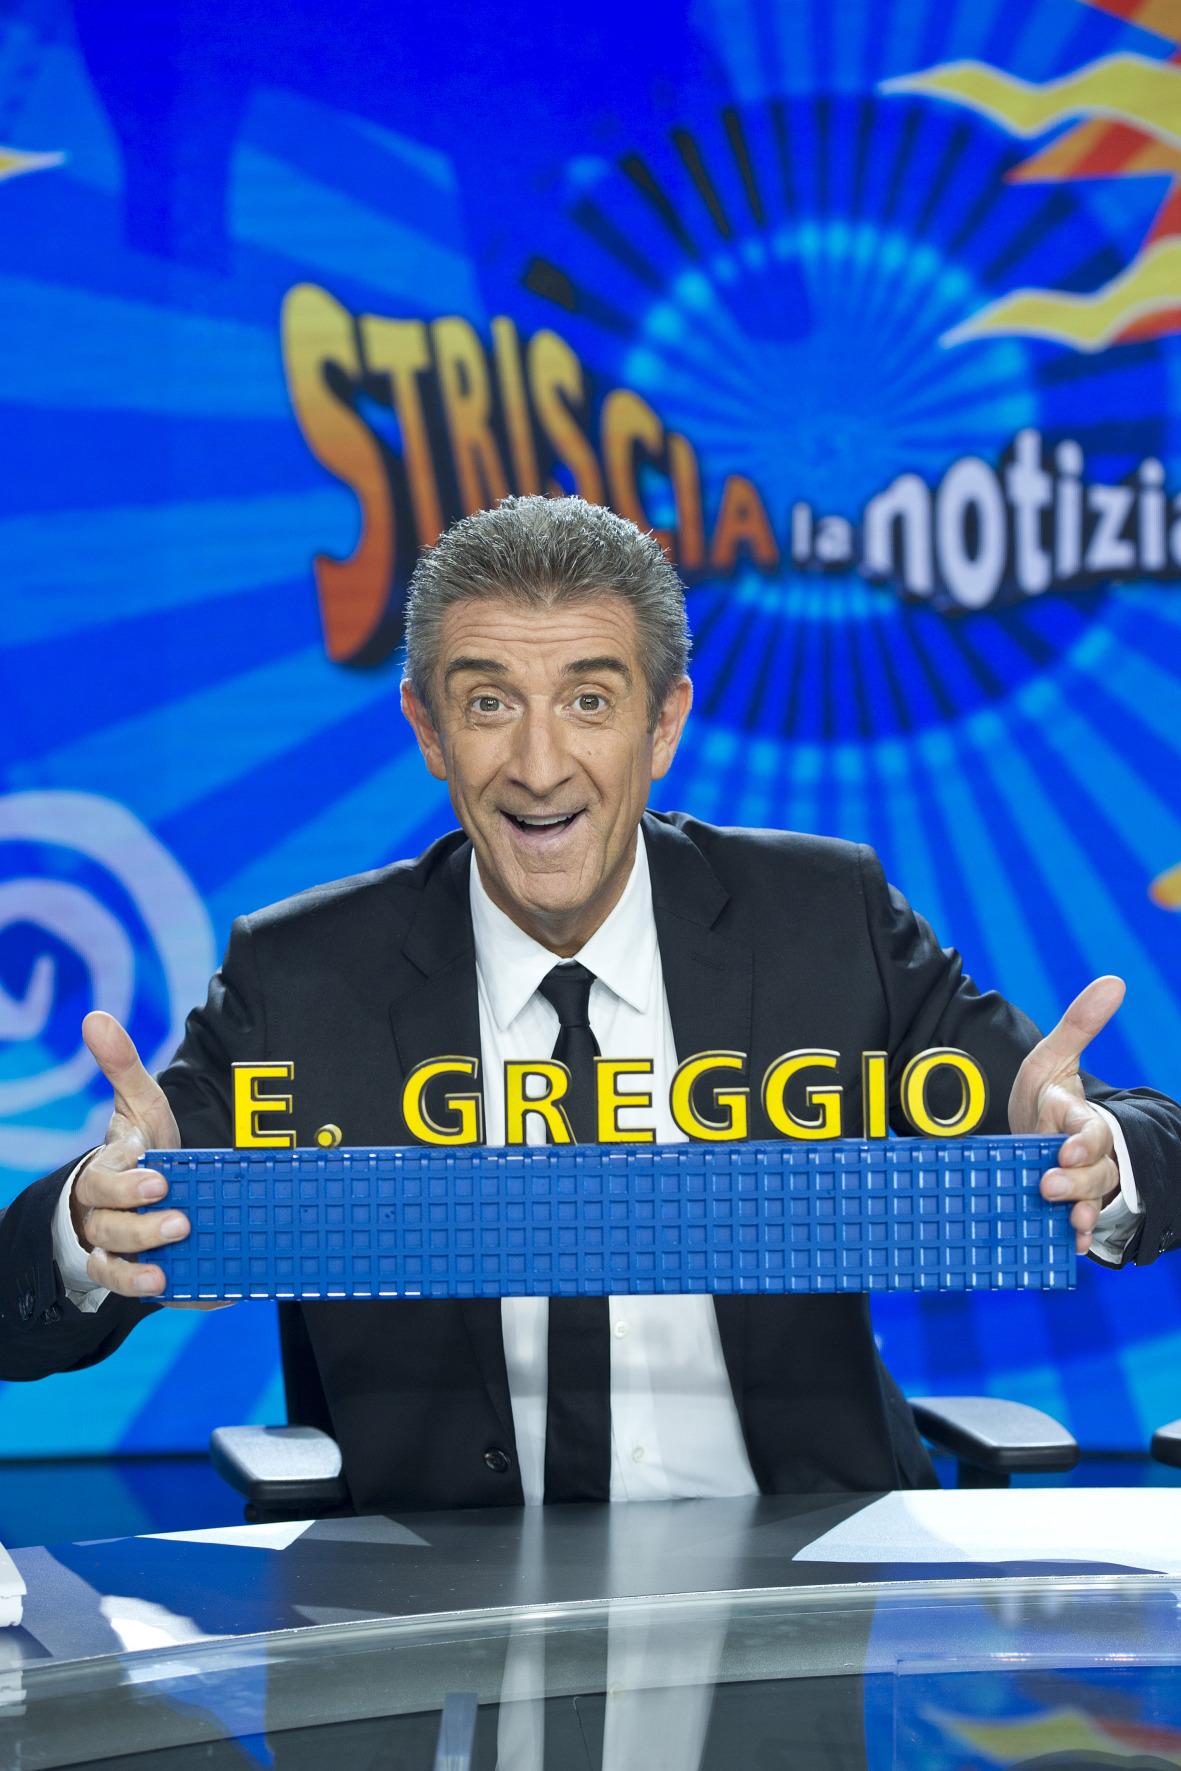 Ezio Greggio